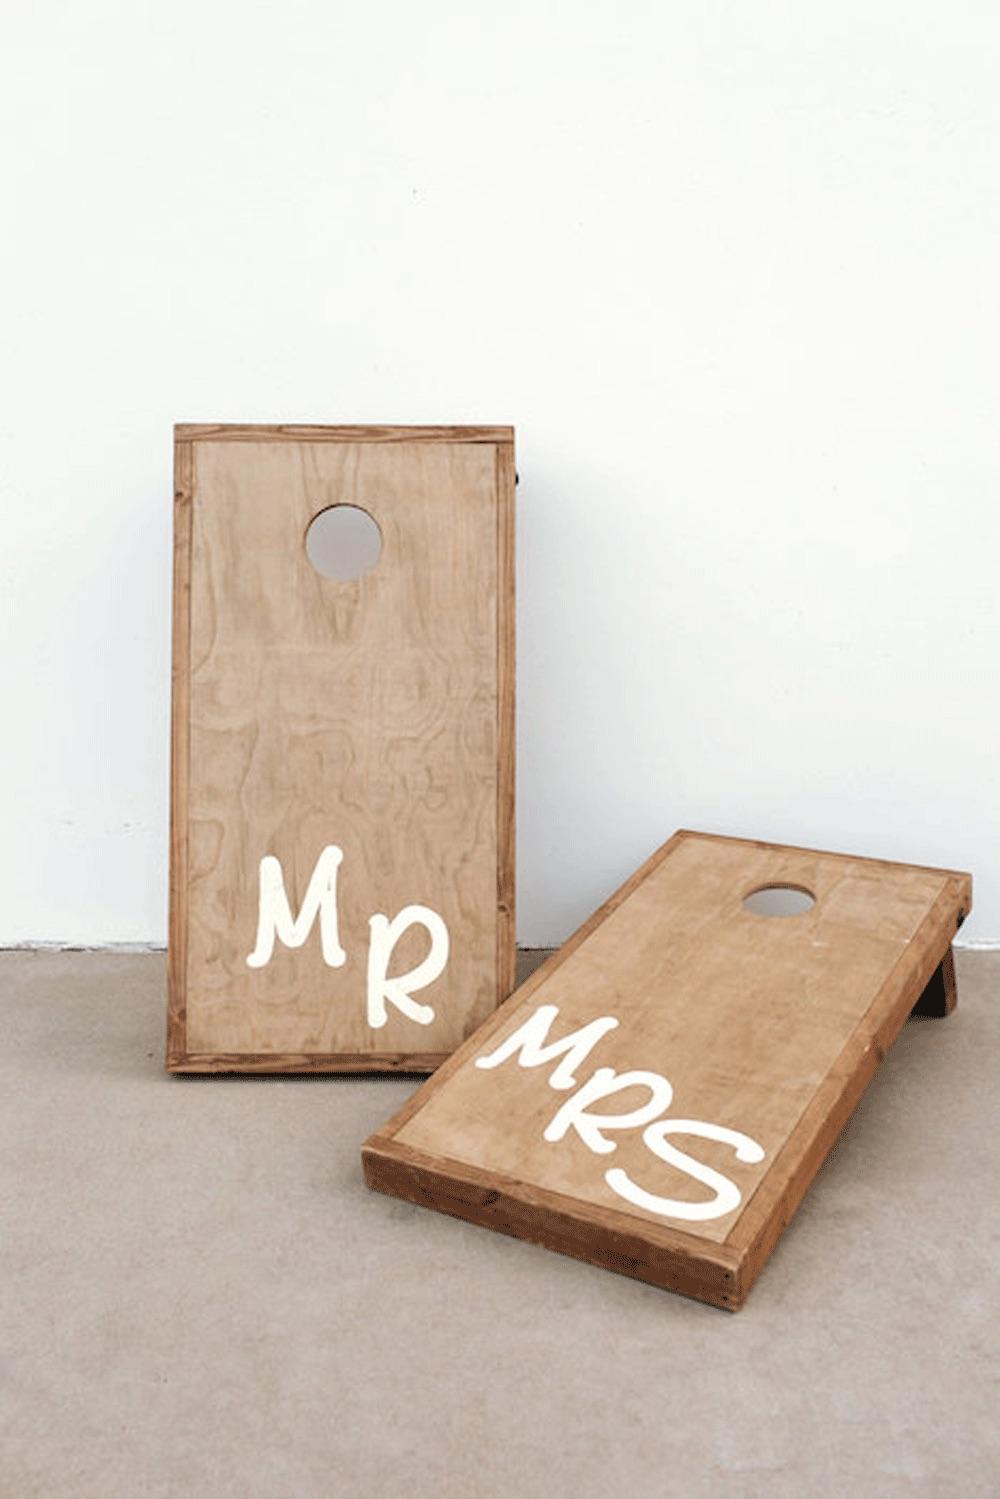 Mr & Mrs Cornhole $50